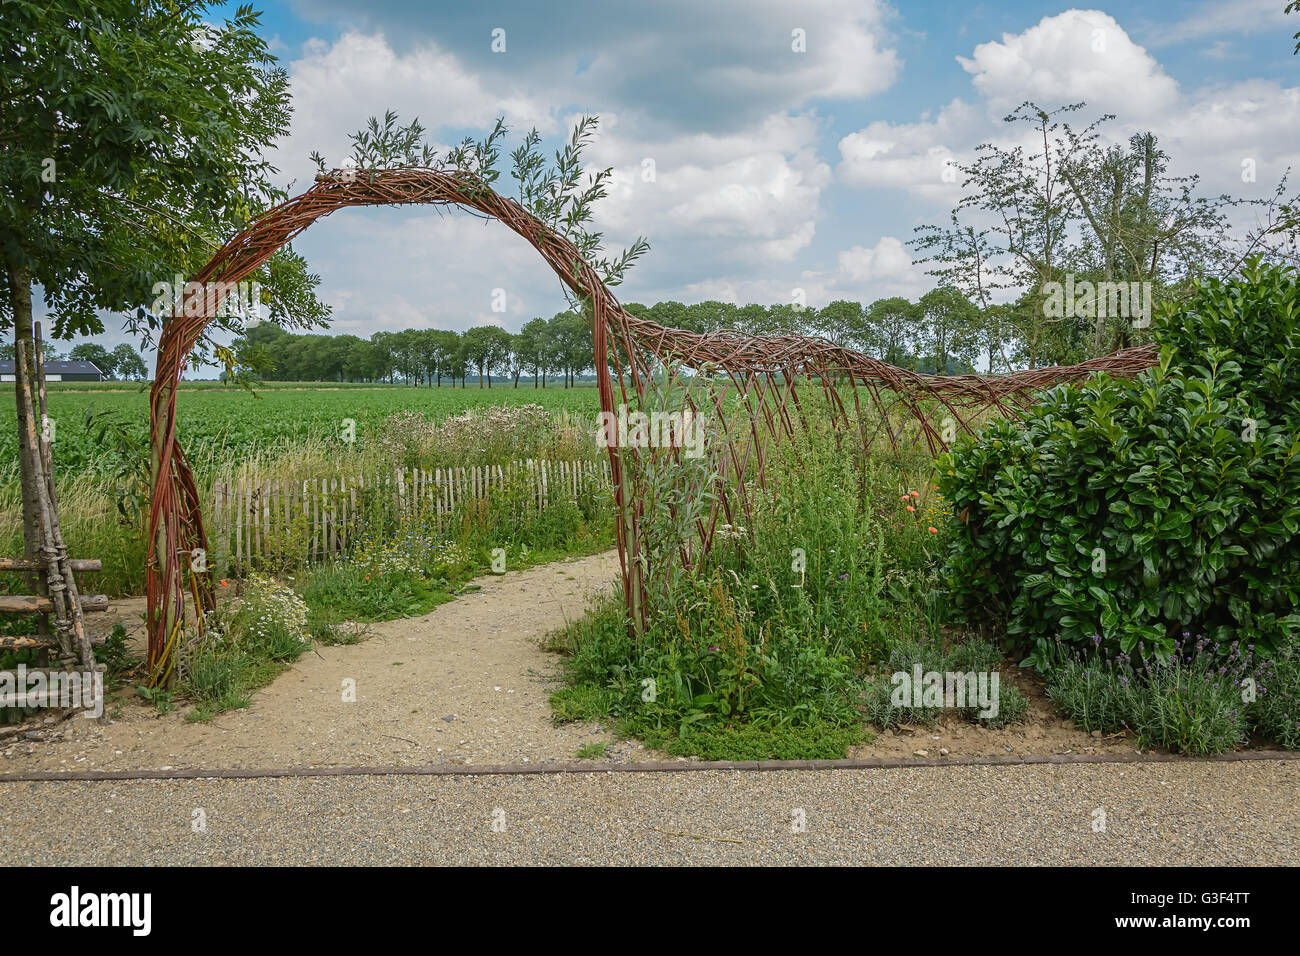 Fence Woven Stockfotos & Fence Woven Bilder - Alamy